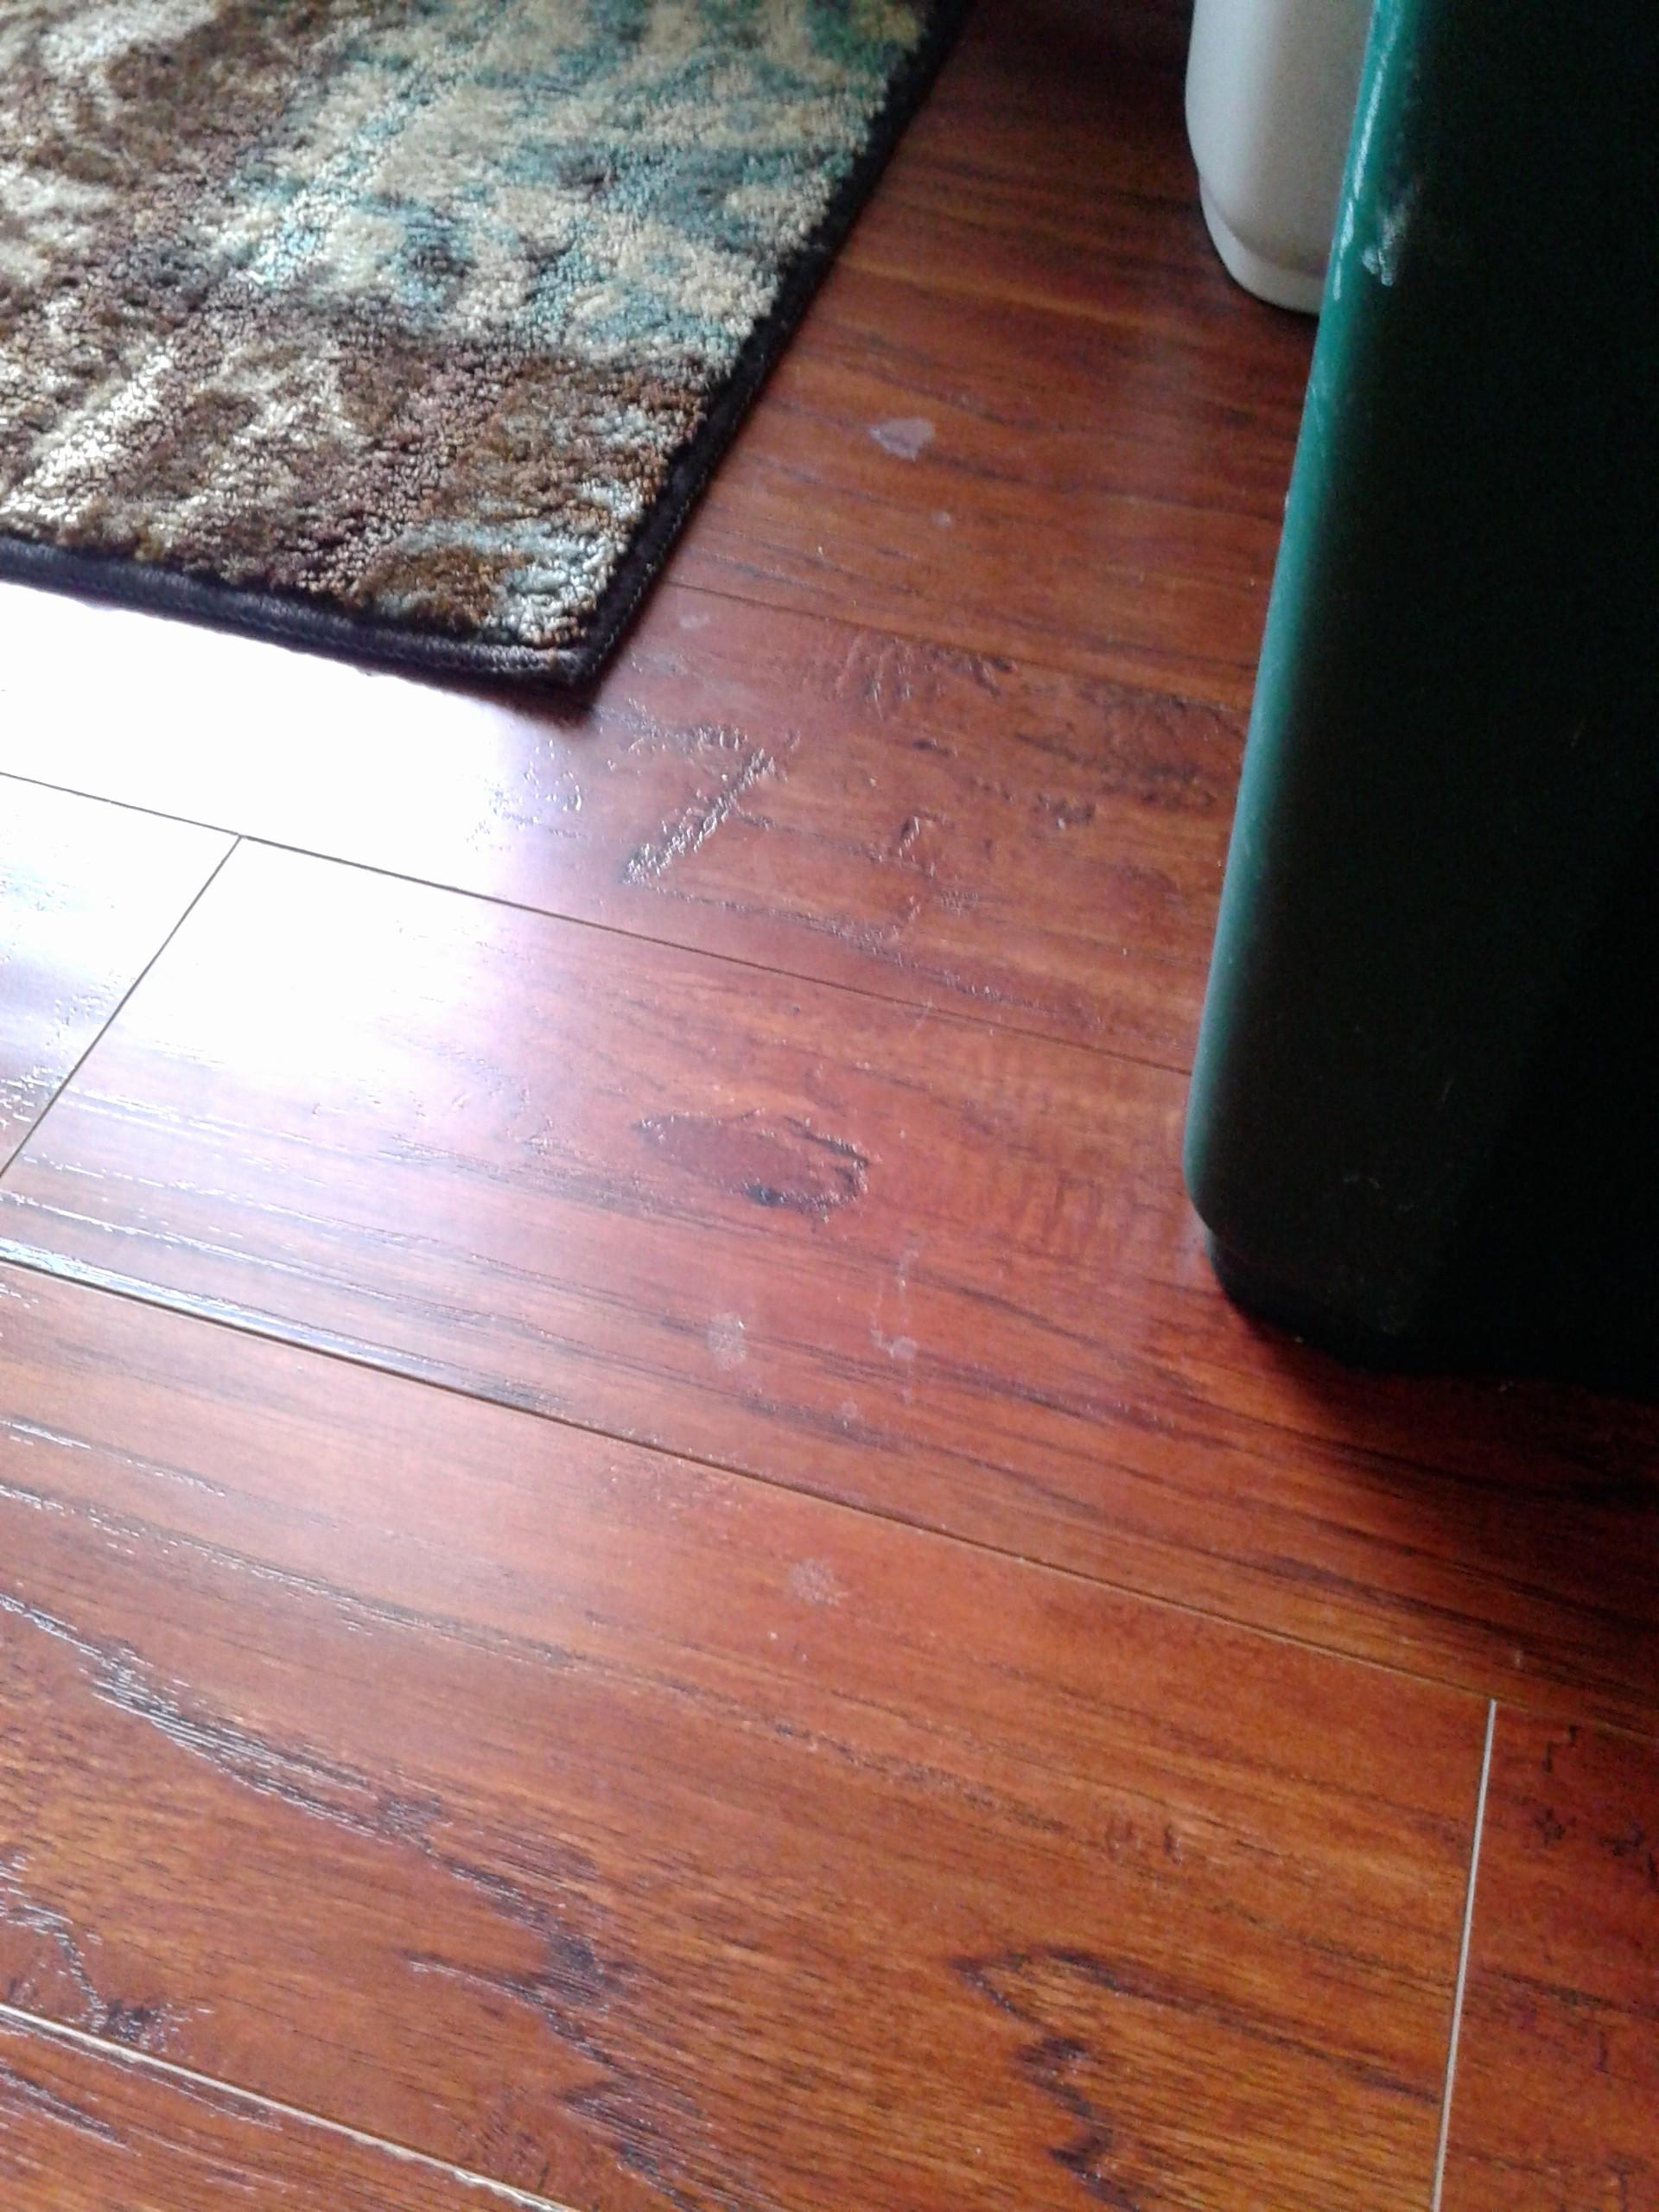 bona pro series hardwood floor care system of 46 elegant the best of bona hardwood floor mop laminate mobel intended for bona hardwood floor mop laminate beautiful 18 inspirational bona hardwood cleaner s dizpos